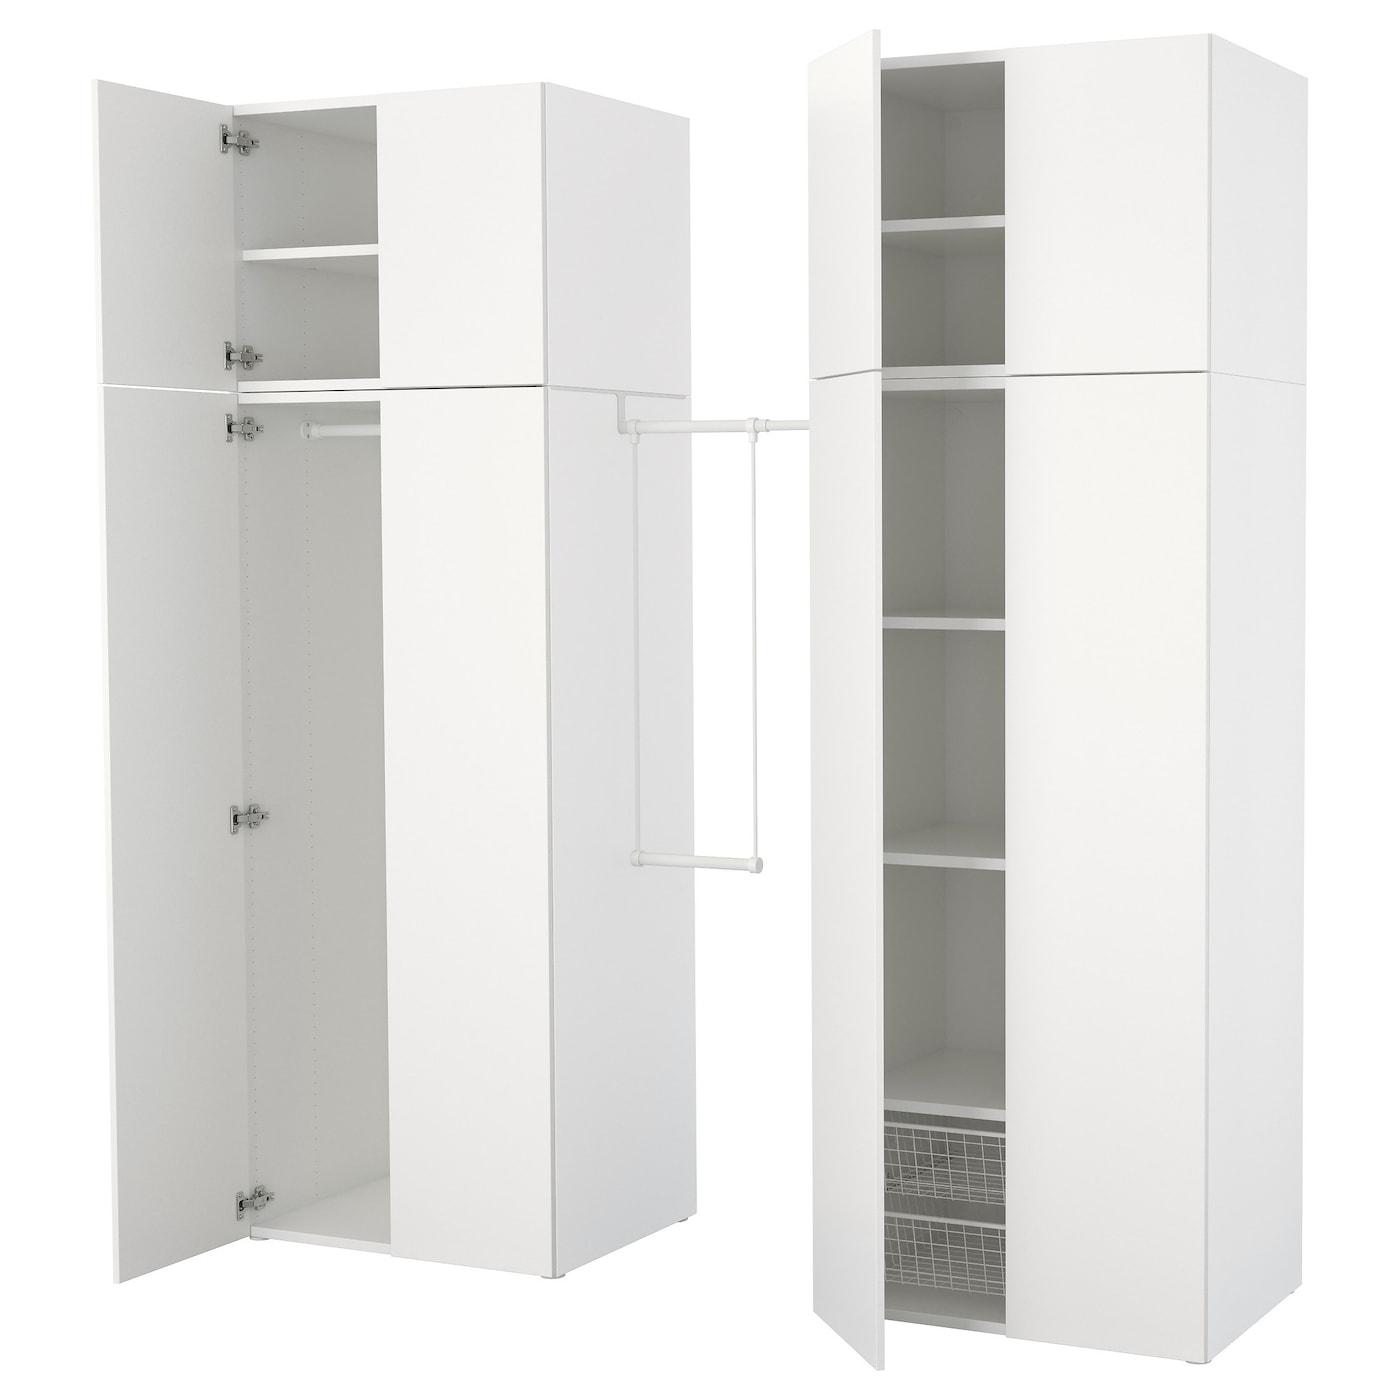 Garde-robes - IKEA